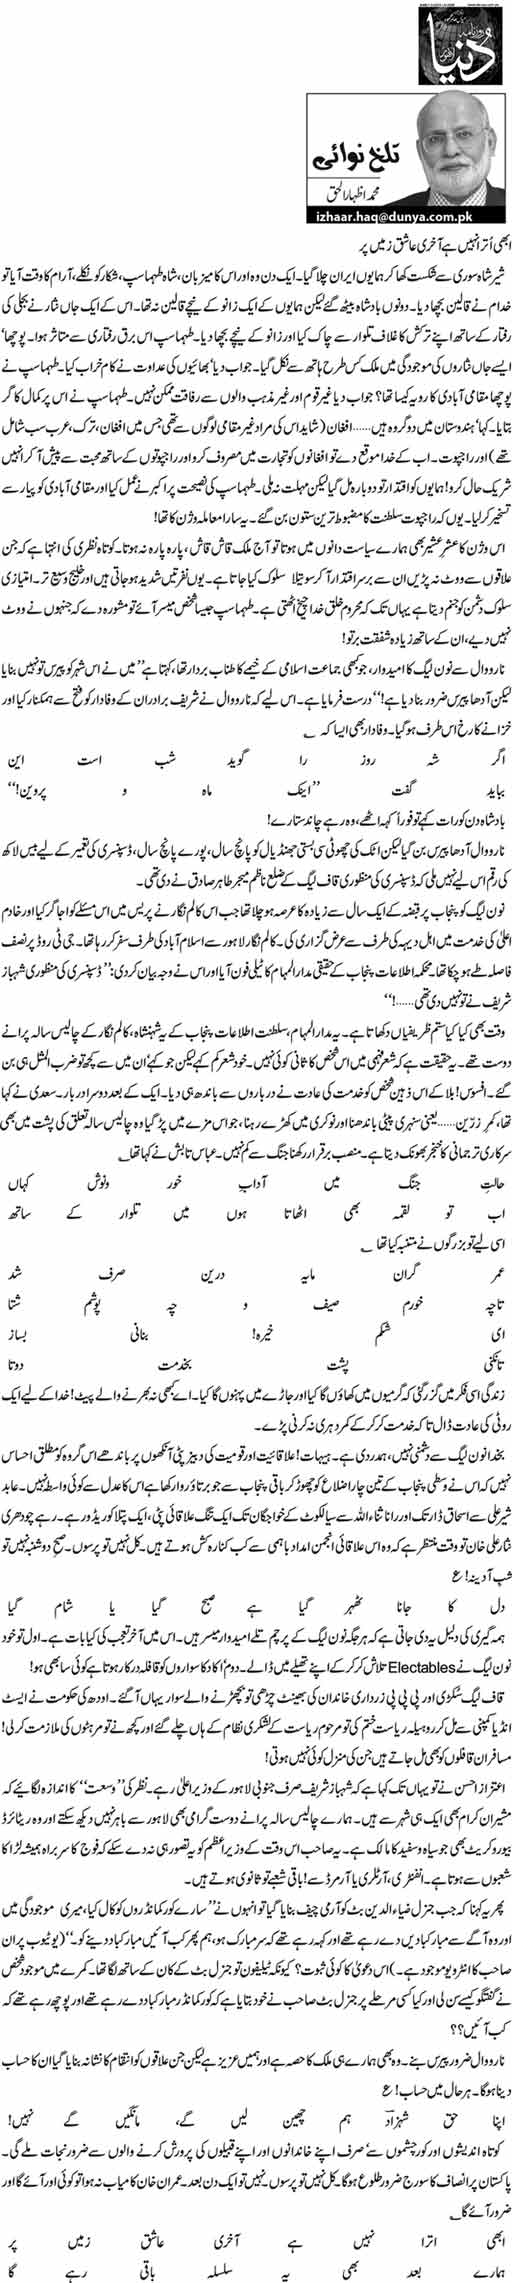 Abbhi Utra Nahi Hai Akhri Ashiq Zameen Par - M. Izhar ul Haq